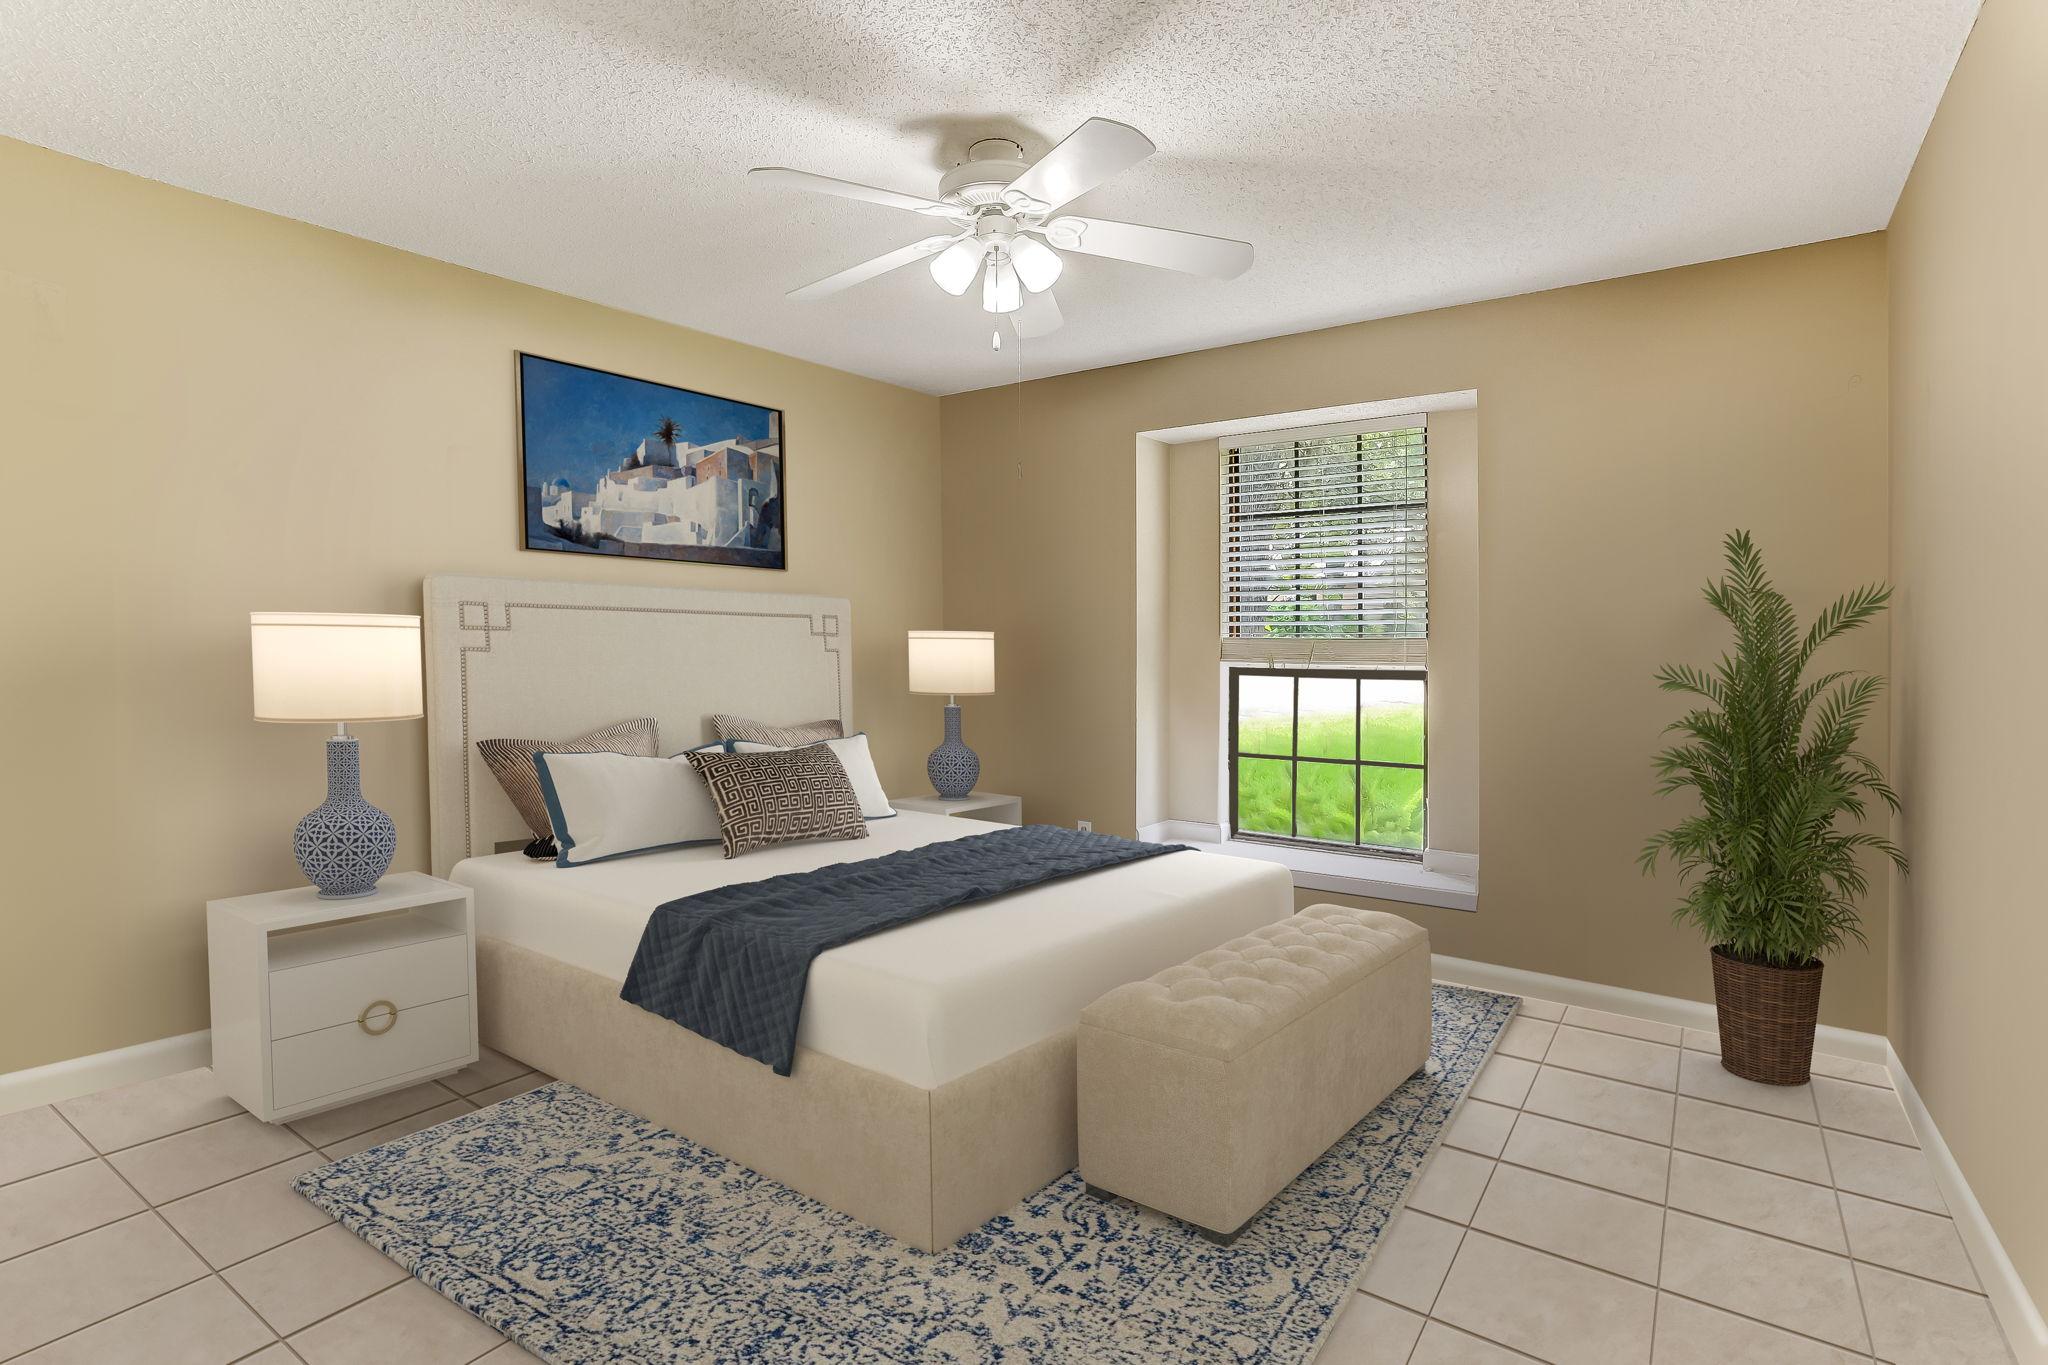 Bedroom 2, roomy and cheerful